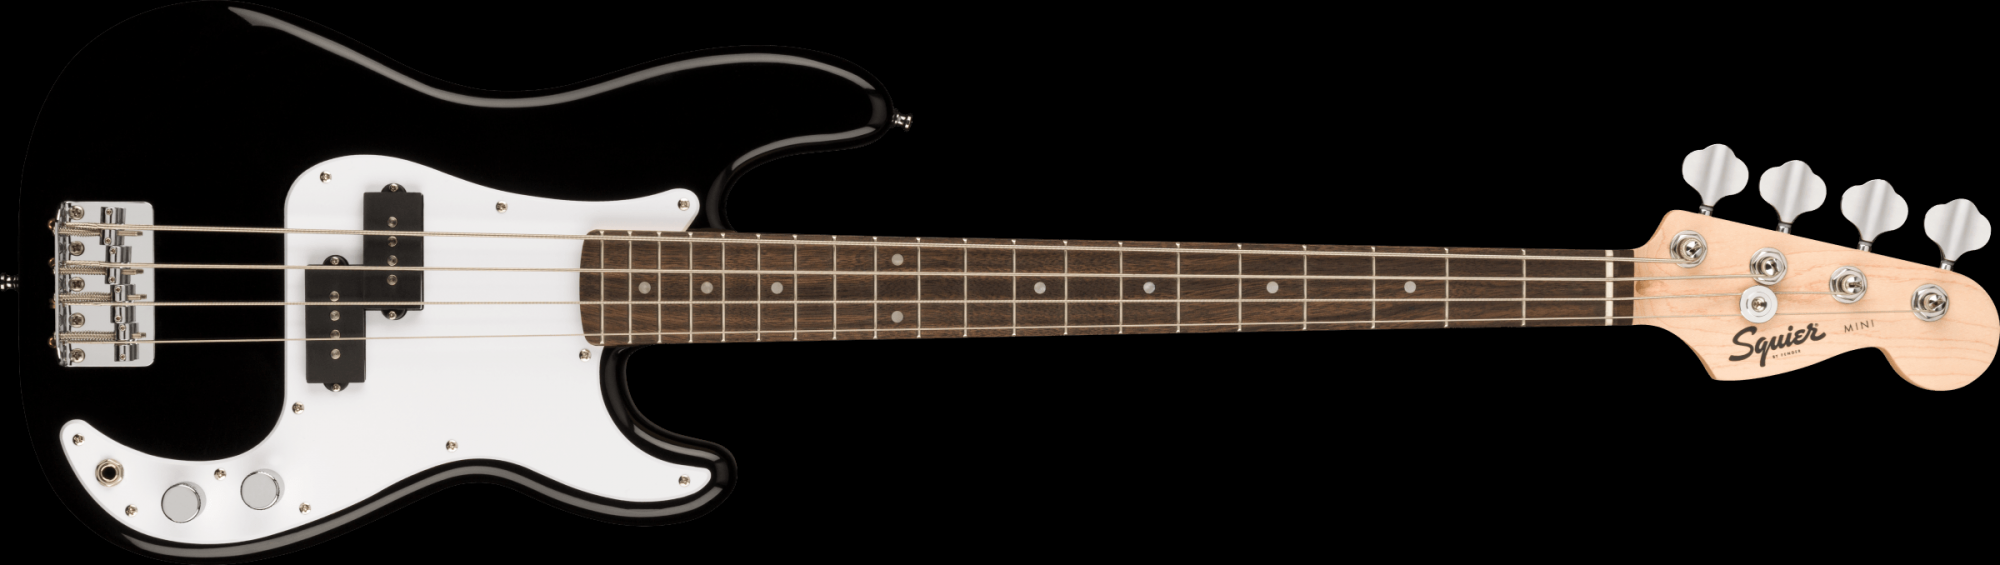 Fender Squire Mini P Bass, Laurel Fingerboard, Black